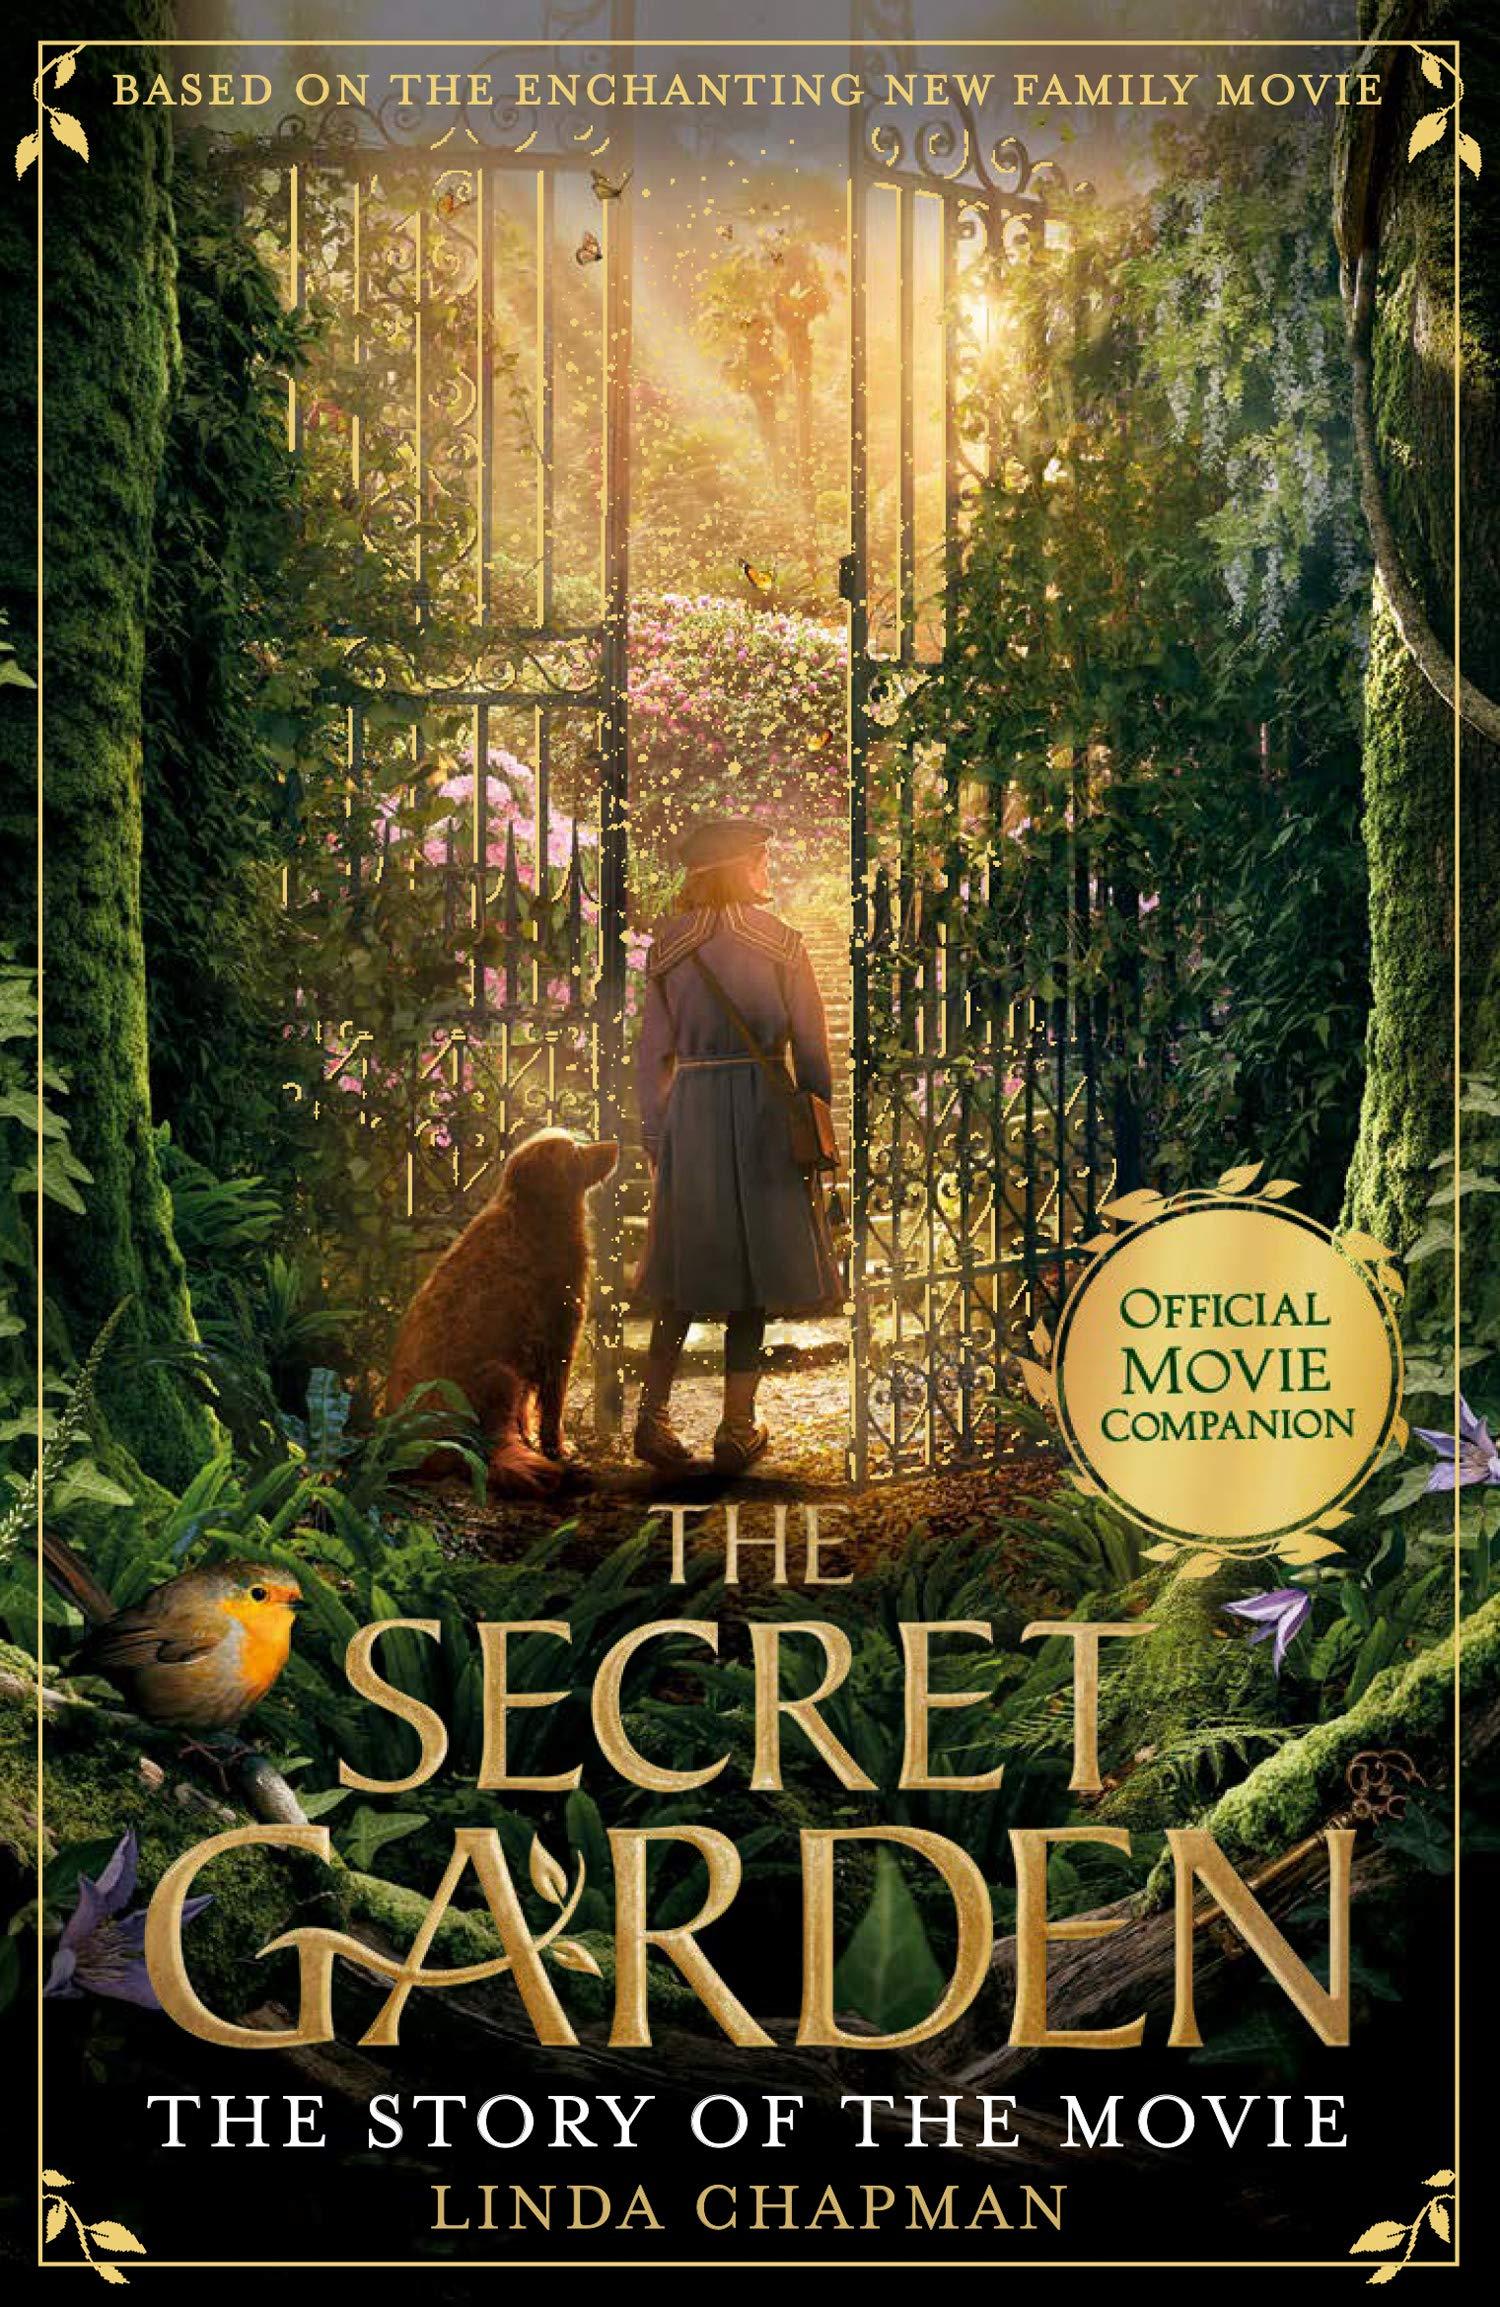 Buy The Secret Garden The Story Of The Movie Secret Garden Film Tie In Book Online At Low Prices In India The Secret Garden The Story Of The Movie Secret Garden